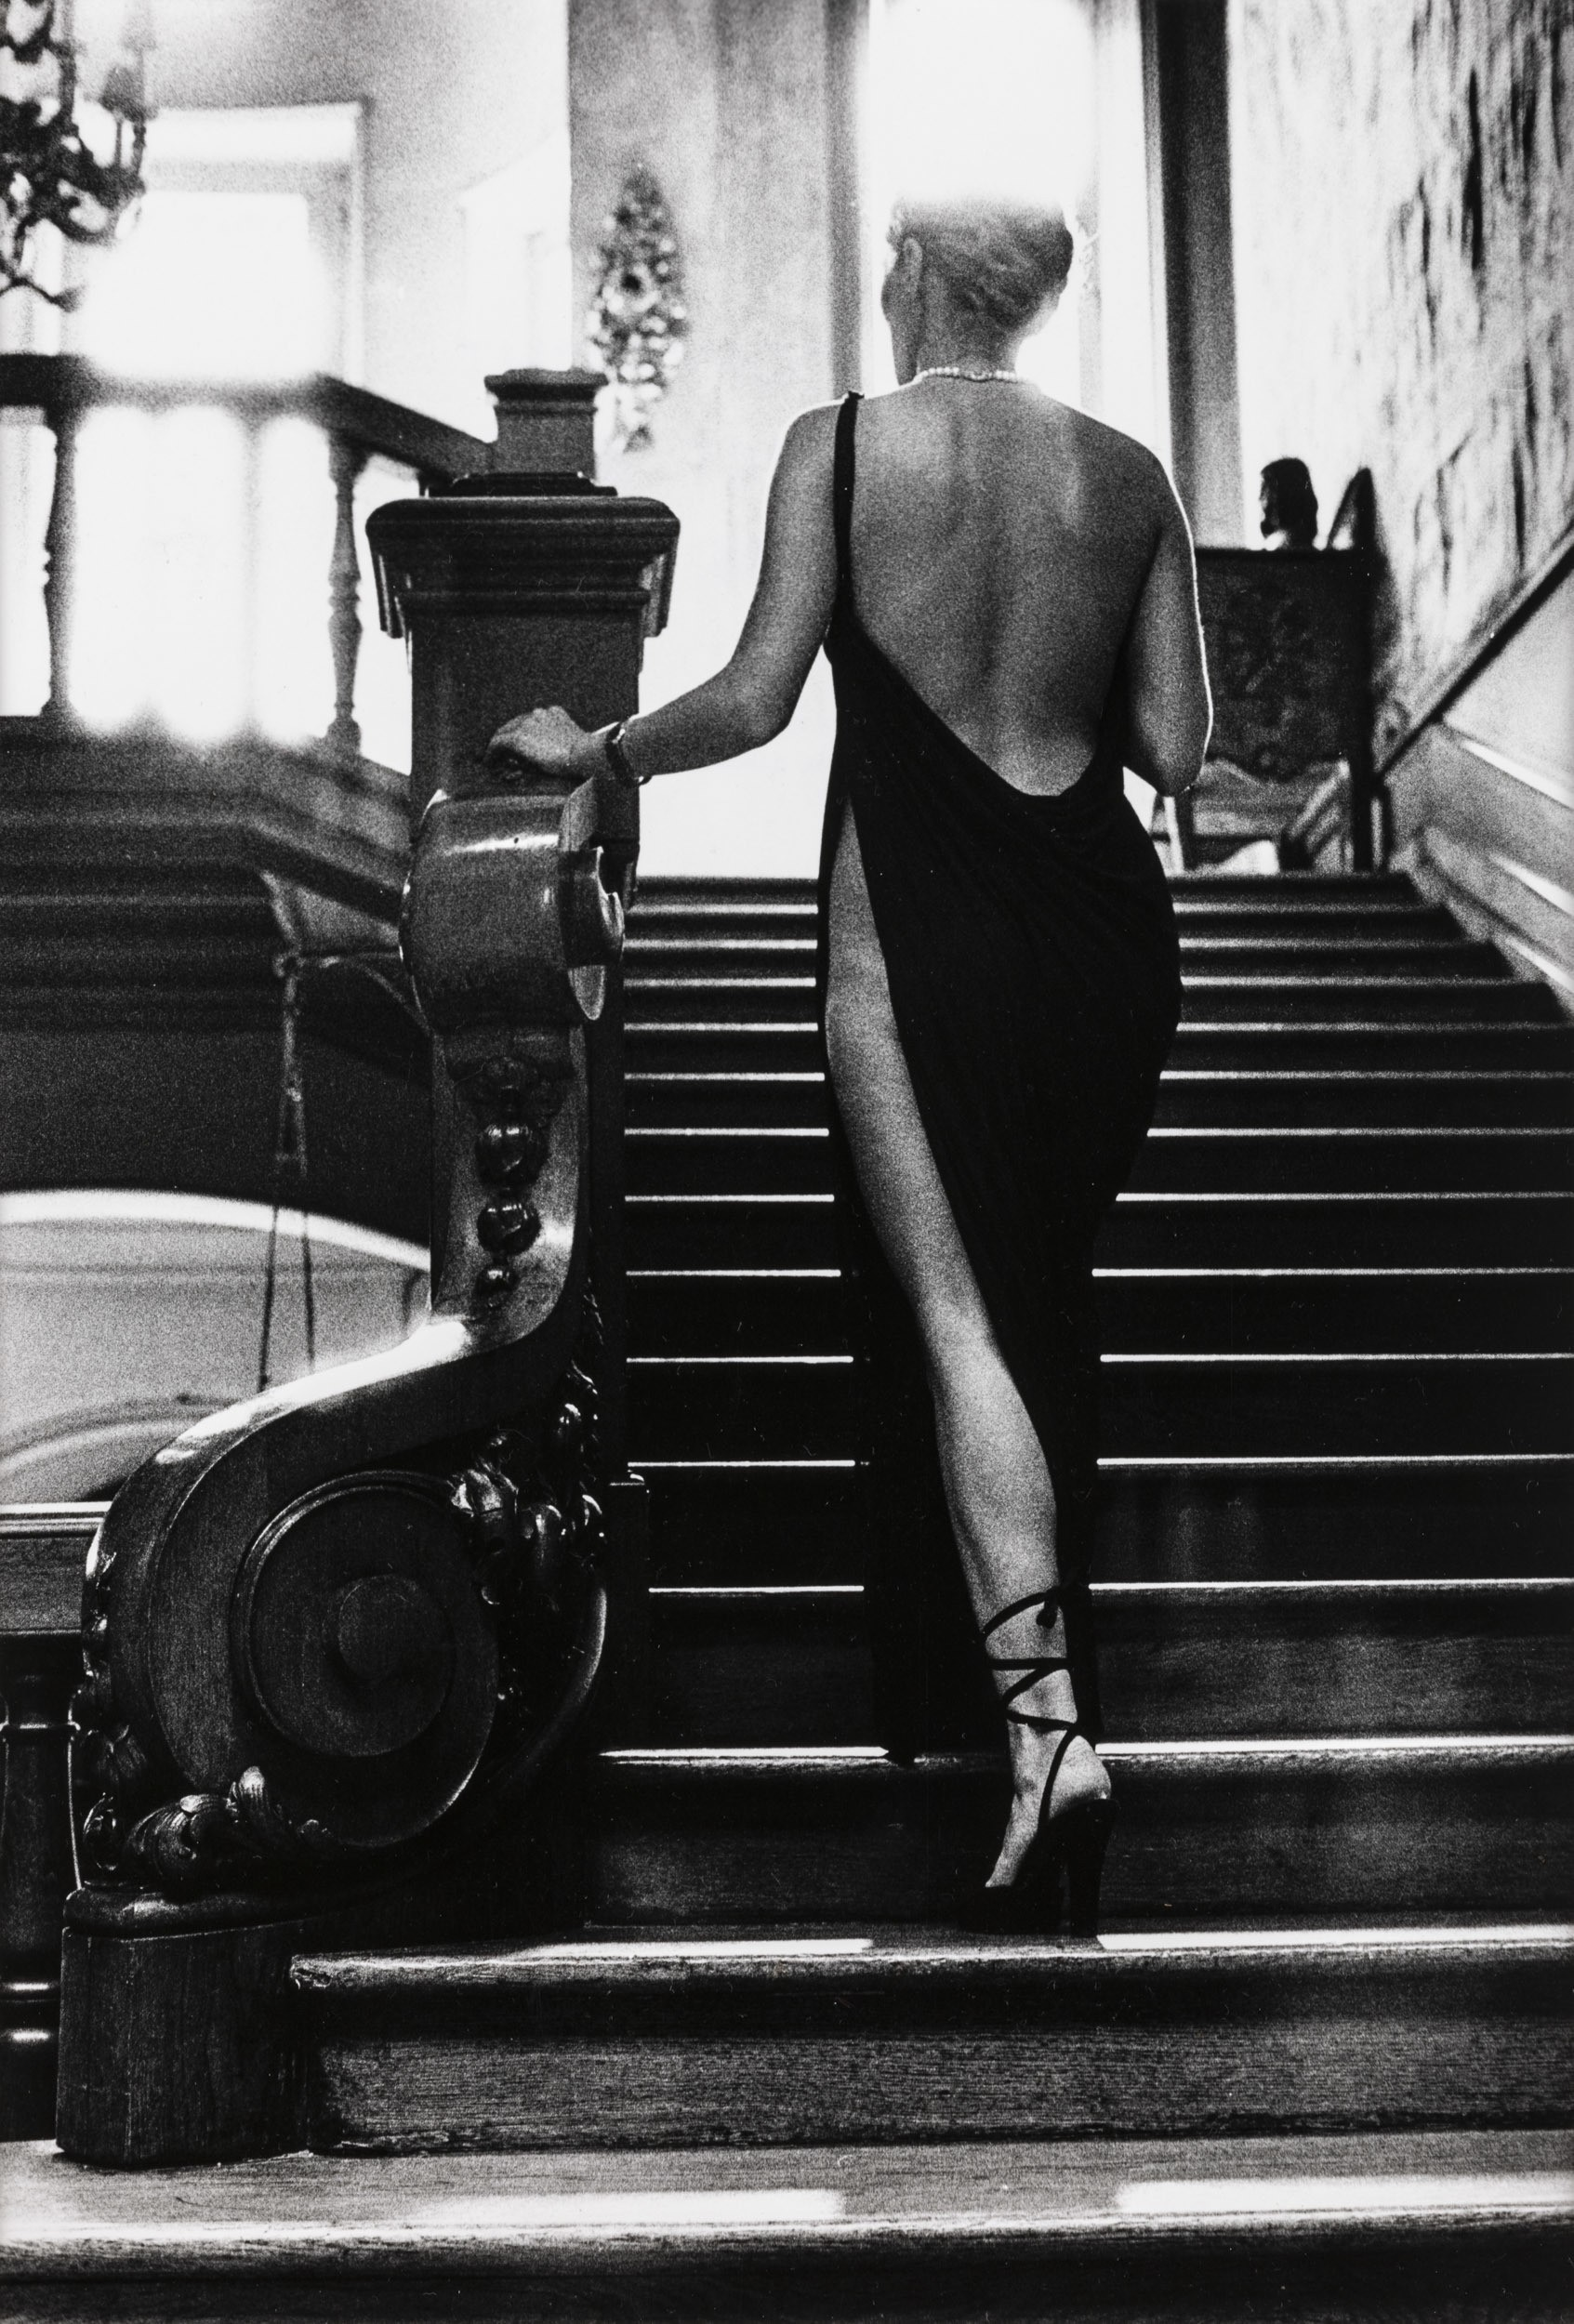 Розалин на лестнице, Арканг, 1975. Автор Хельмут Ньютон